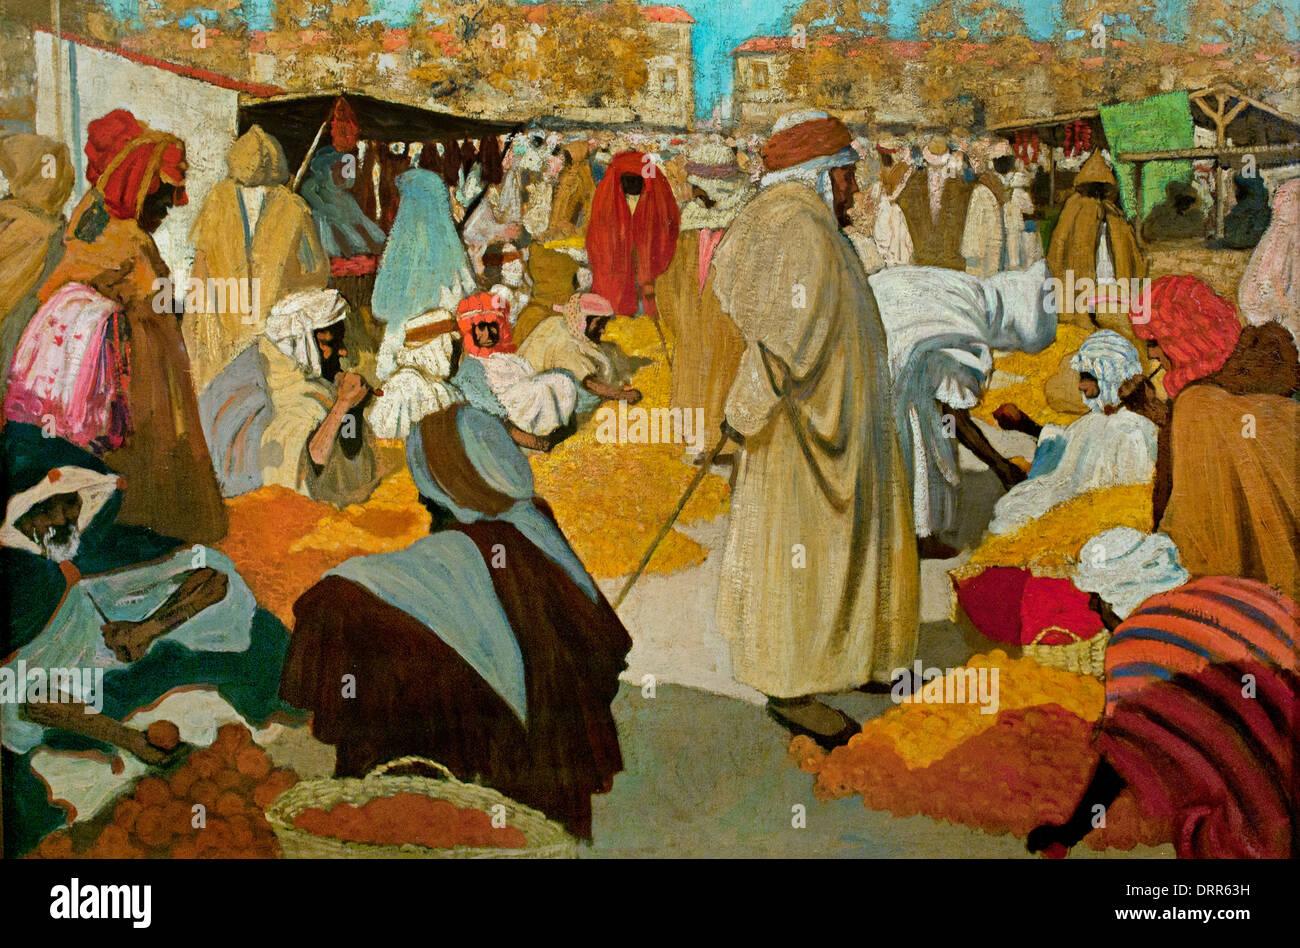 Henri Evenepoel (1872-1899) Orange Market en Blidah 1898 Mercado árabe Argelia belga de Flandes Bélgica Imagen De Stock